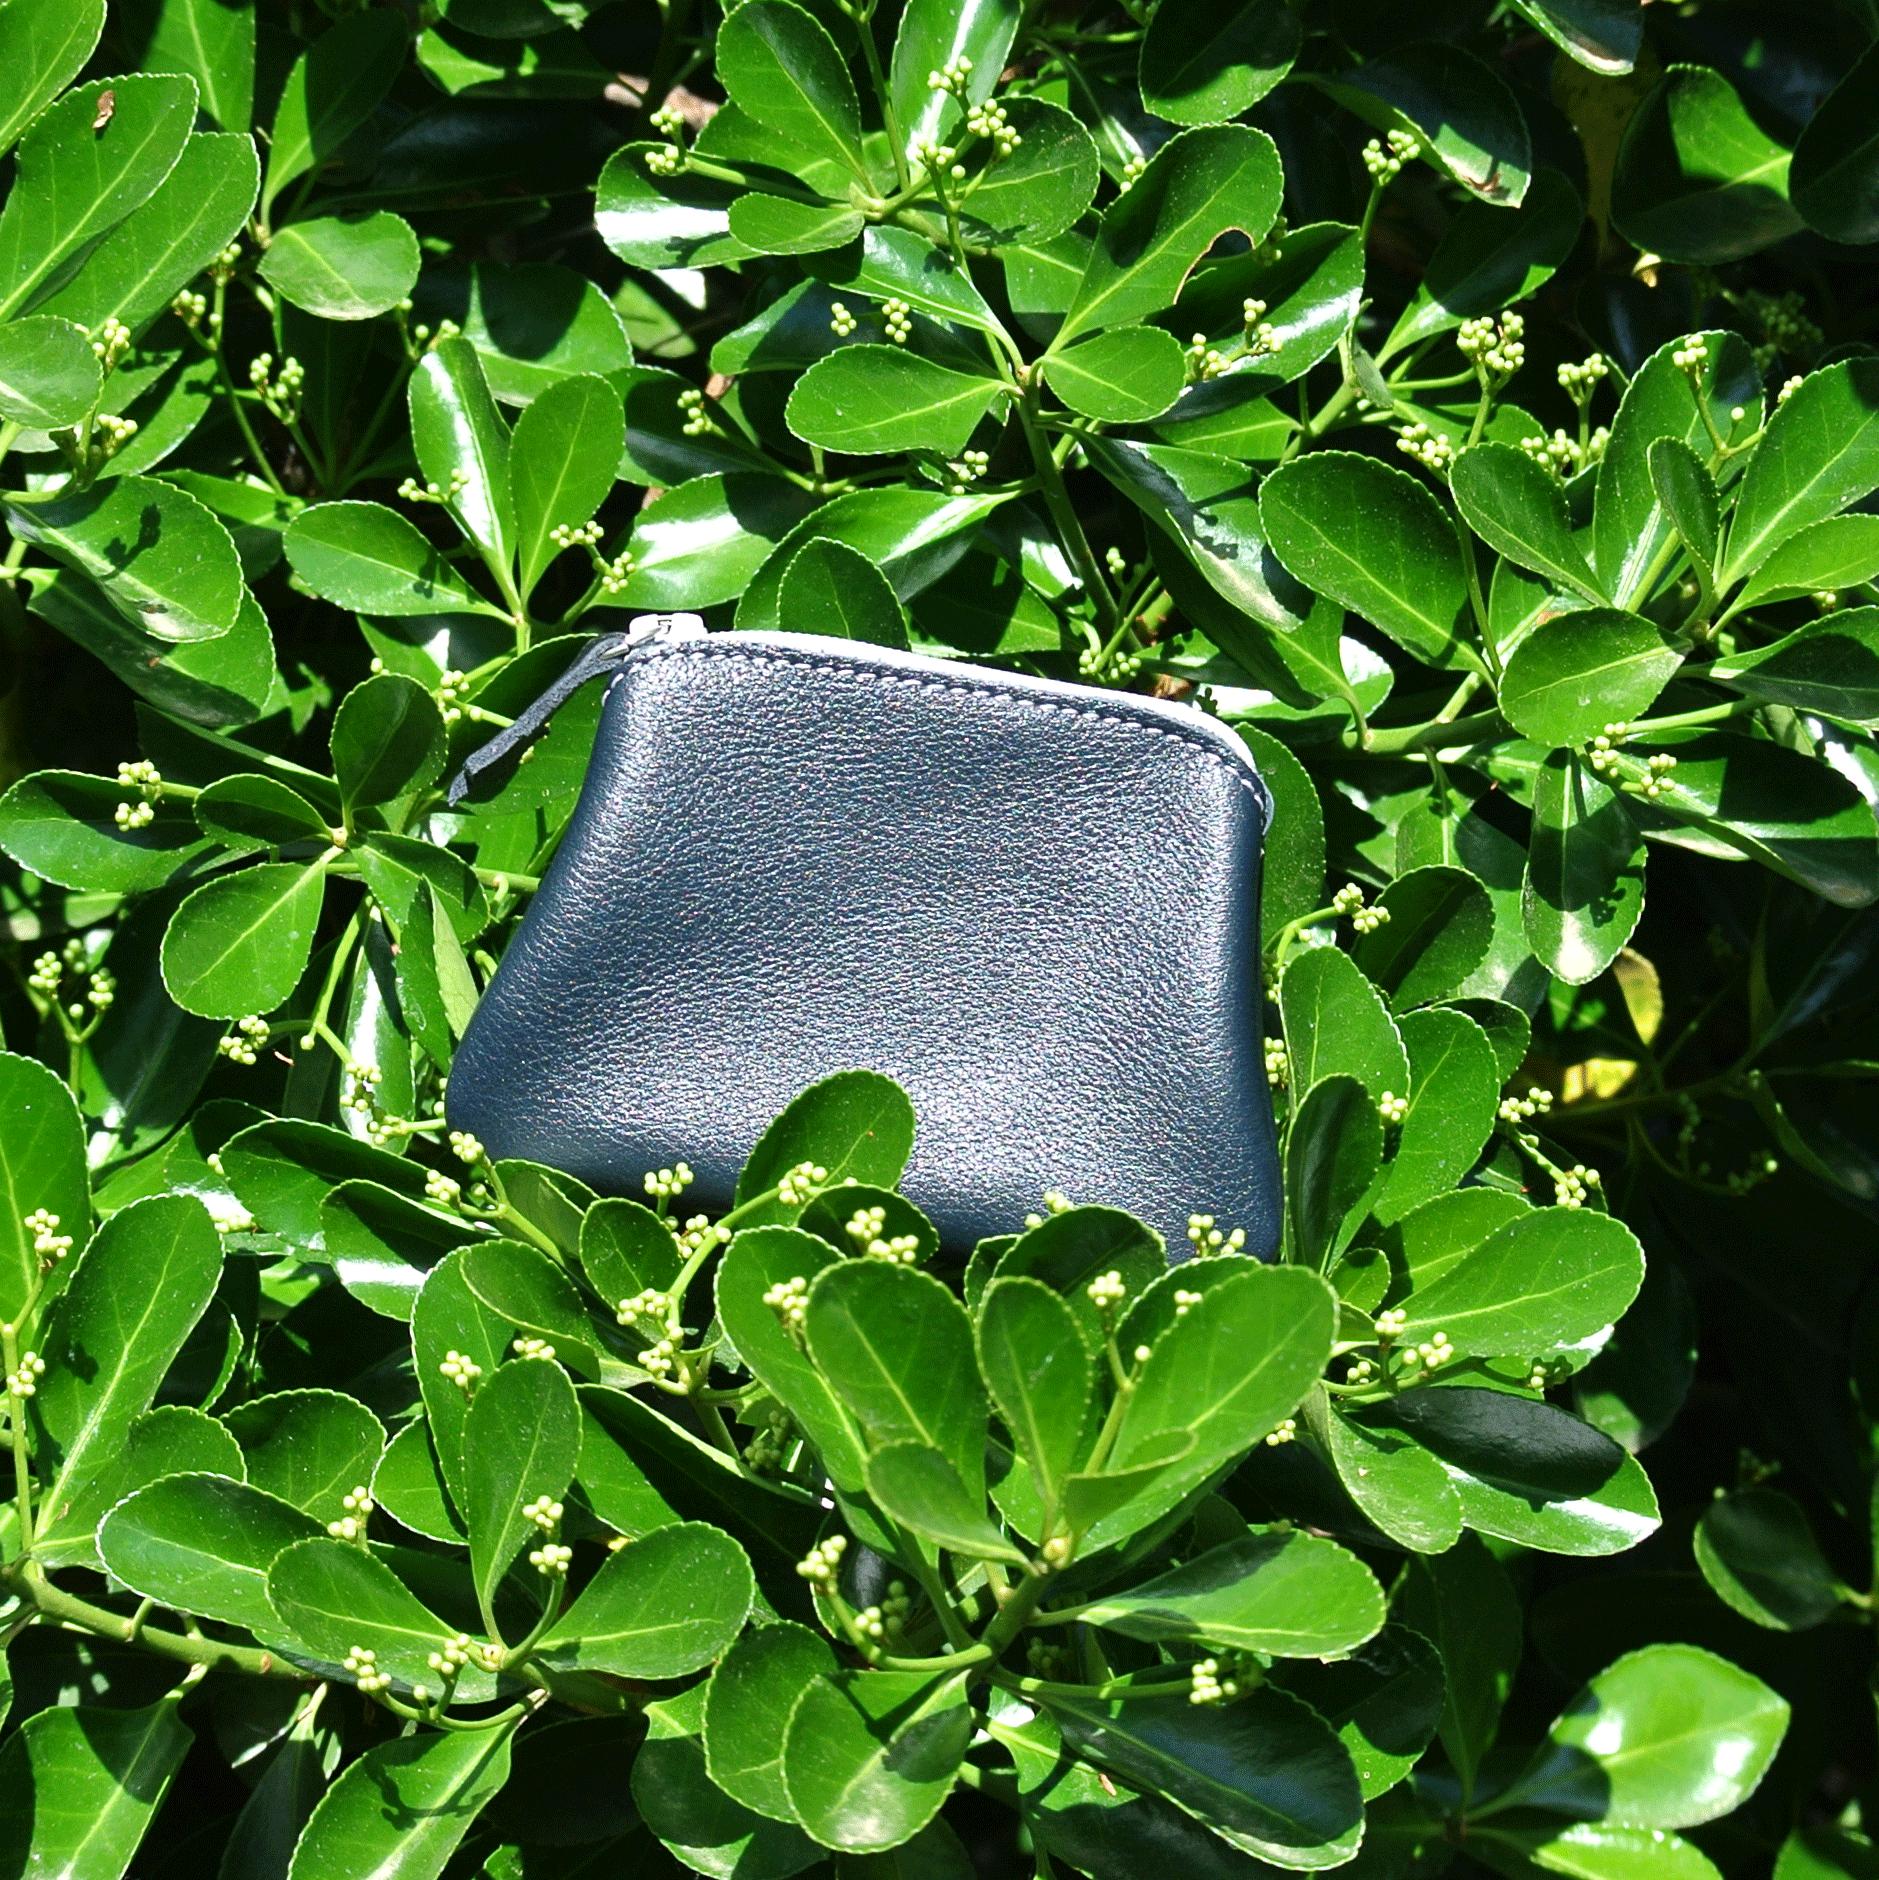 cuirs-fantaisies-la-cartabliere-fabrique-en-france-porte-monnaie-kiwi-en-cuir-nappa-noir